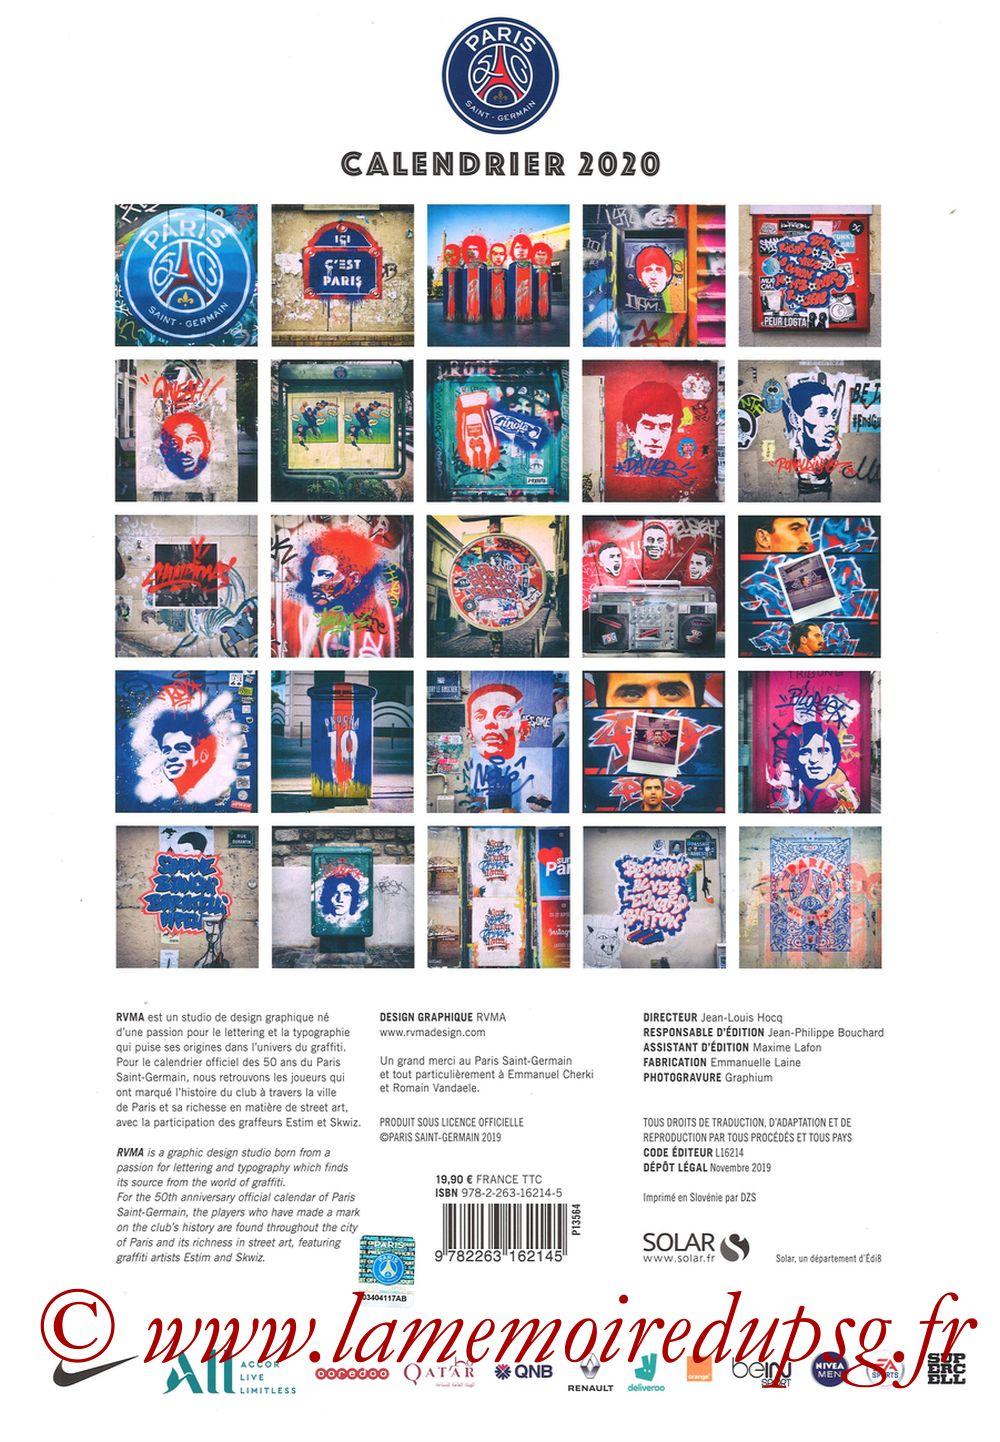 Calendrier PSG 2020 - Page 25 - Dos Album